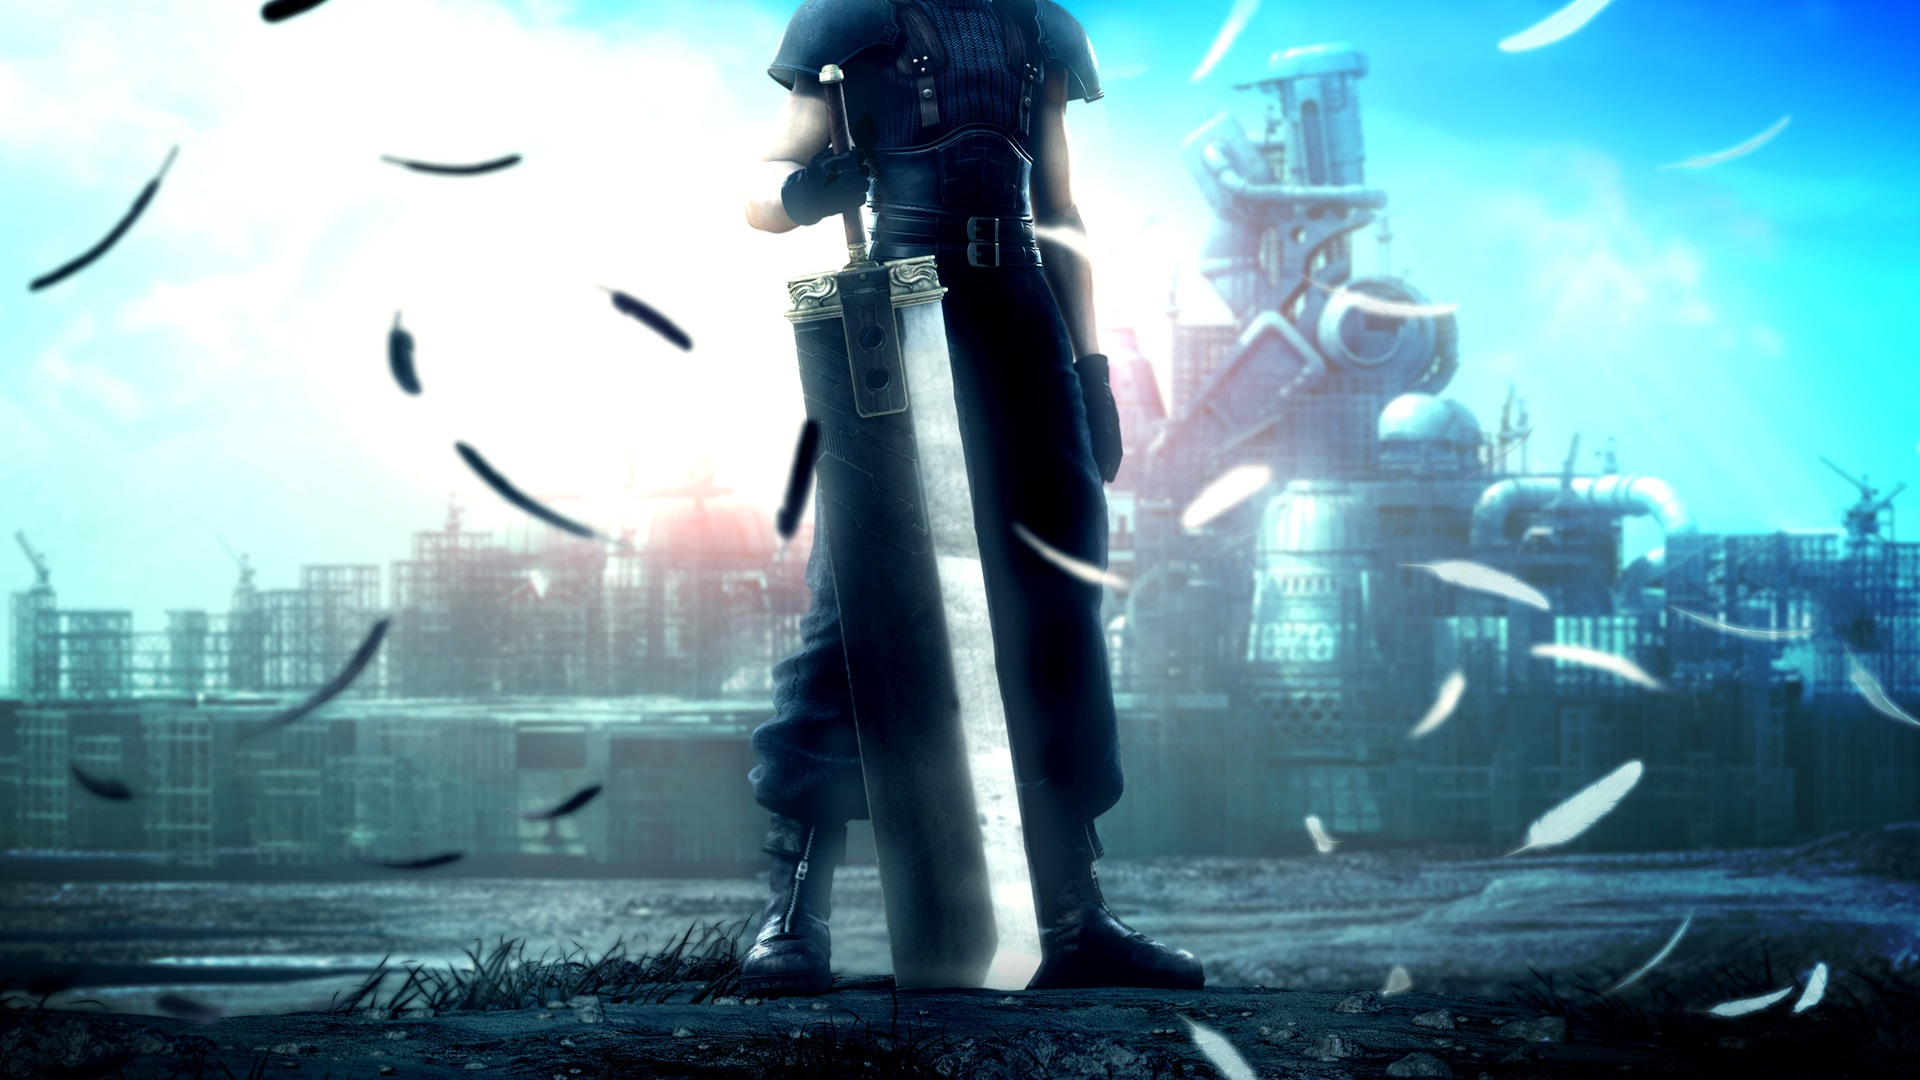 News Final Fantasy VII Remake E3 Pressekonferenz 2015 Sony 1920x1080